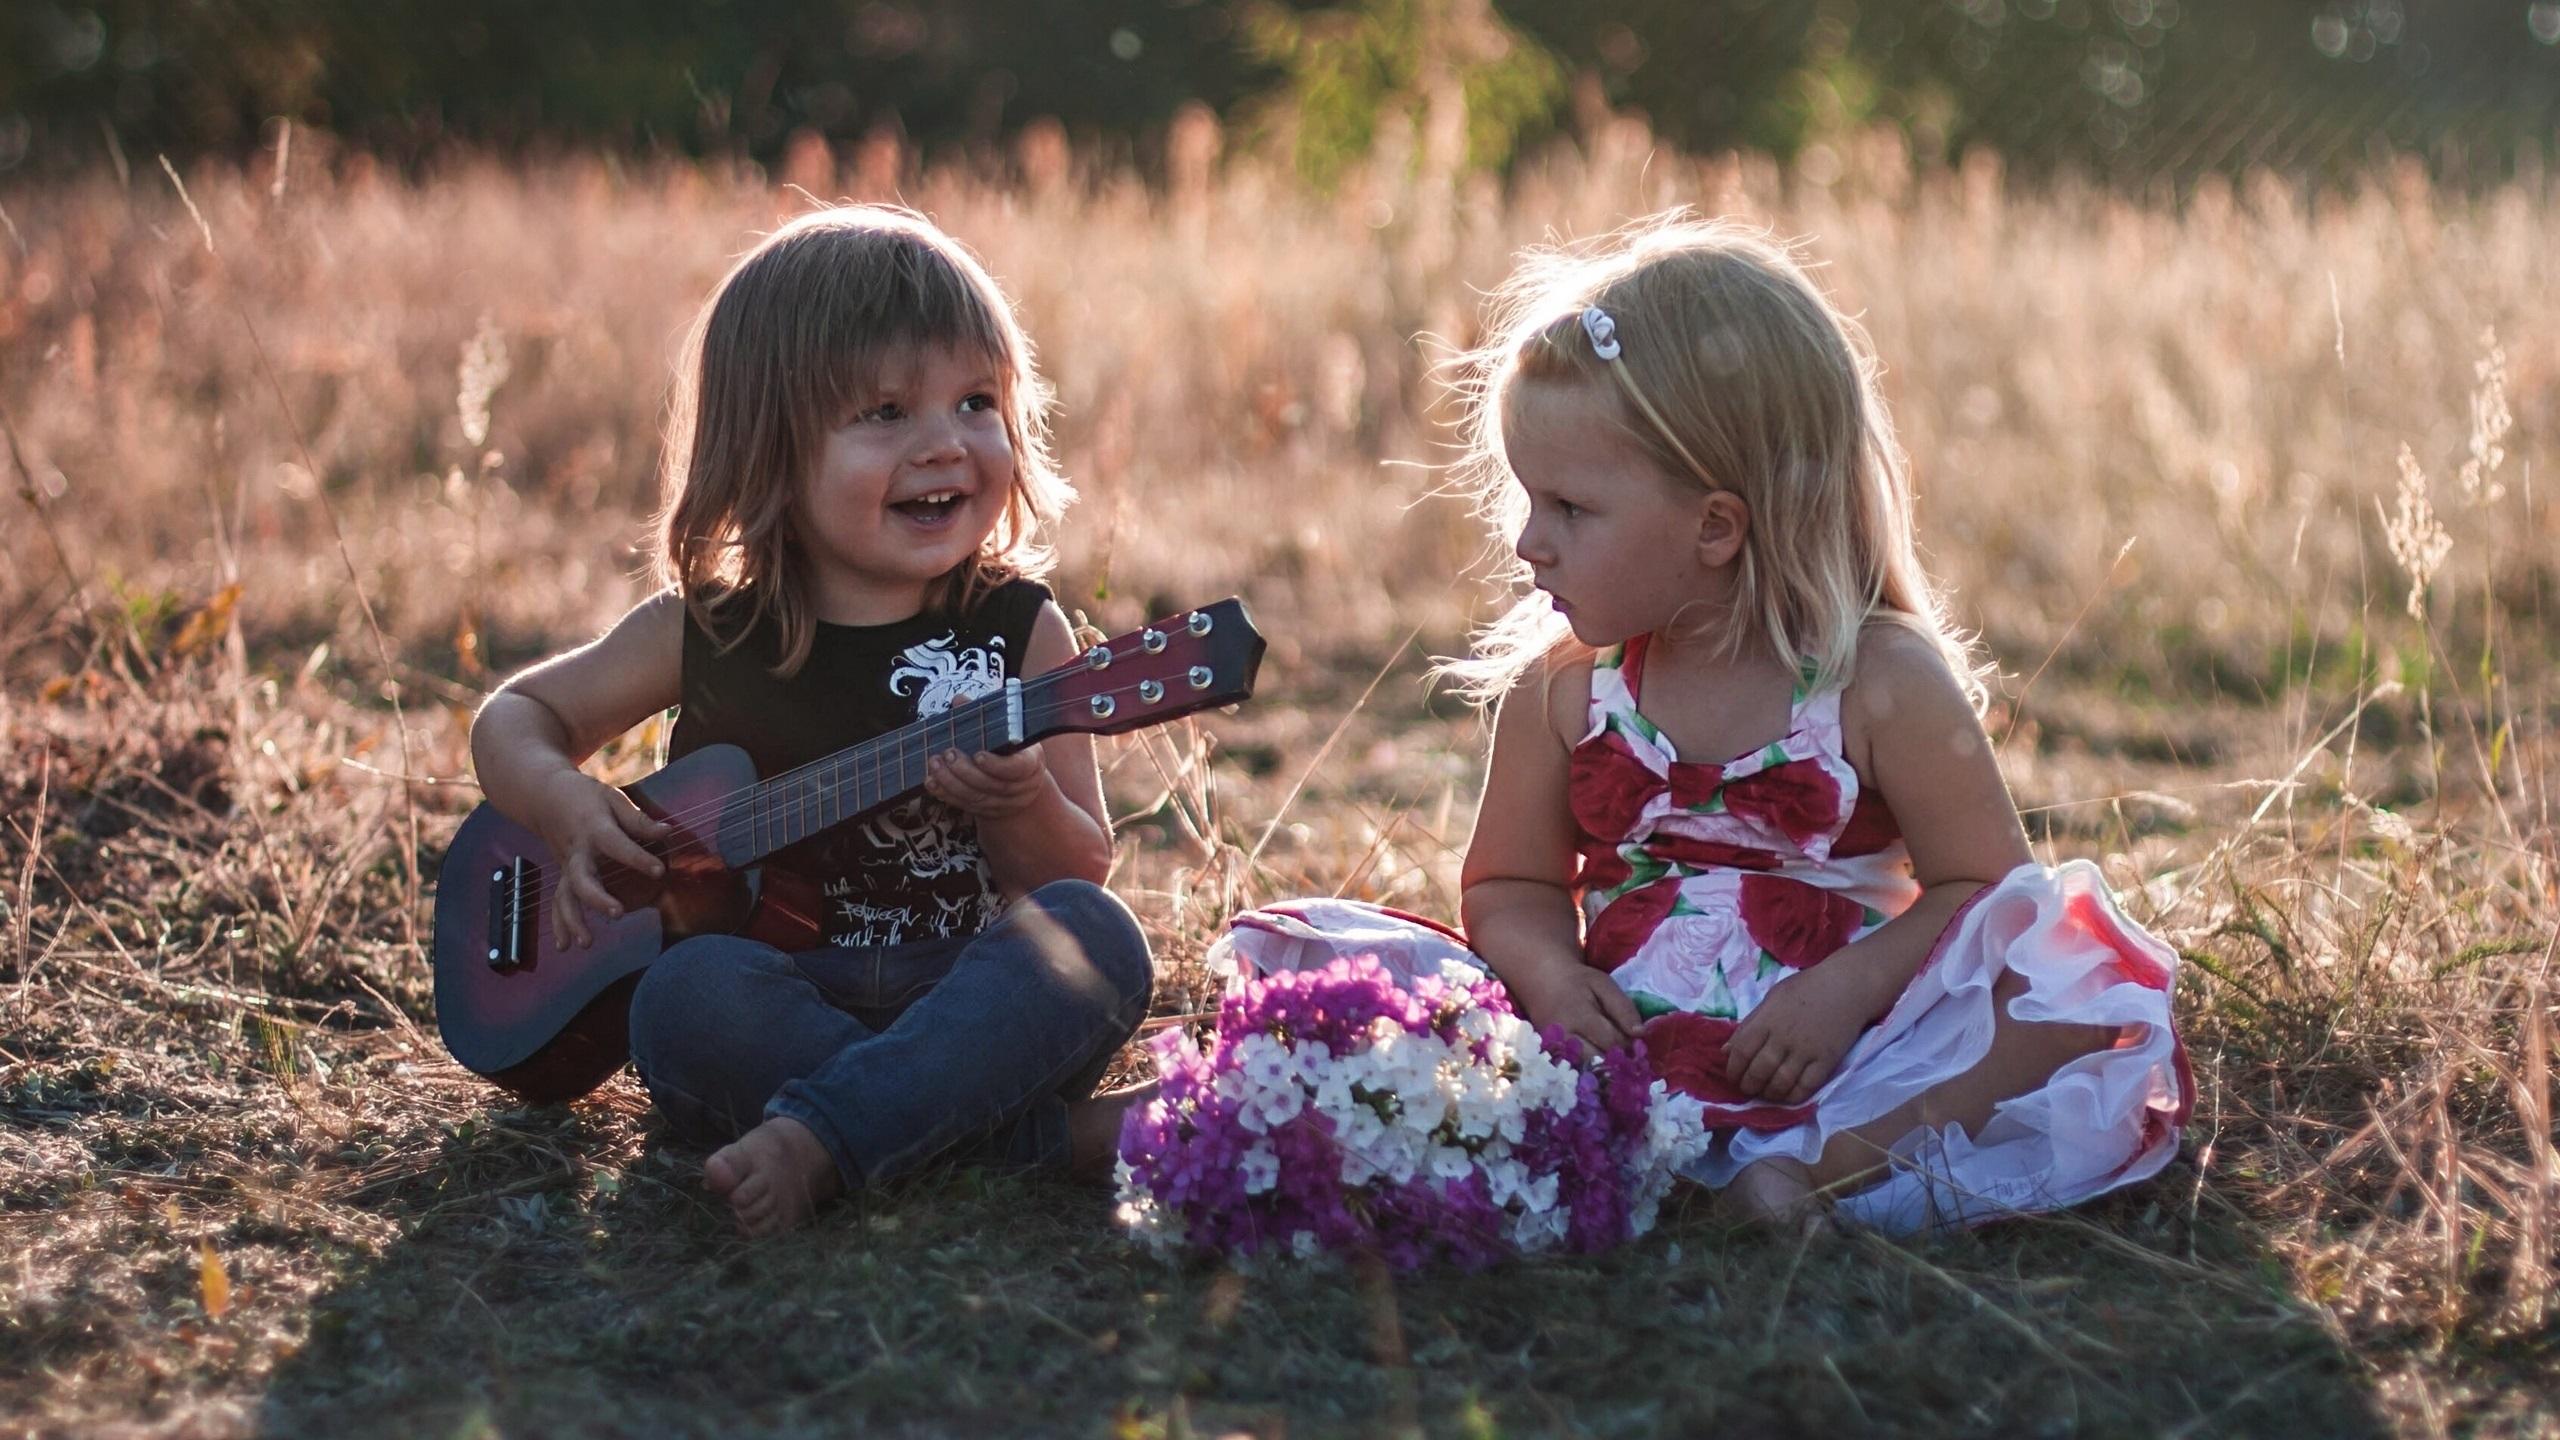 wallpaper children, cute girls, guitar 2560x1440 qhd picture, image